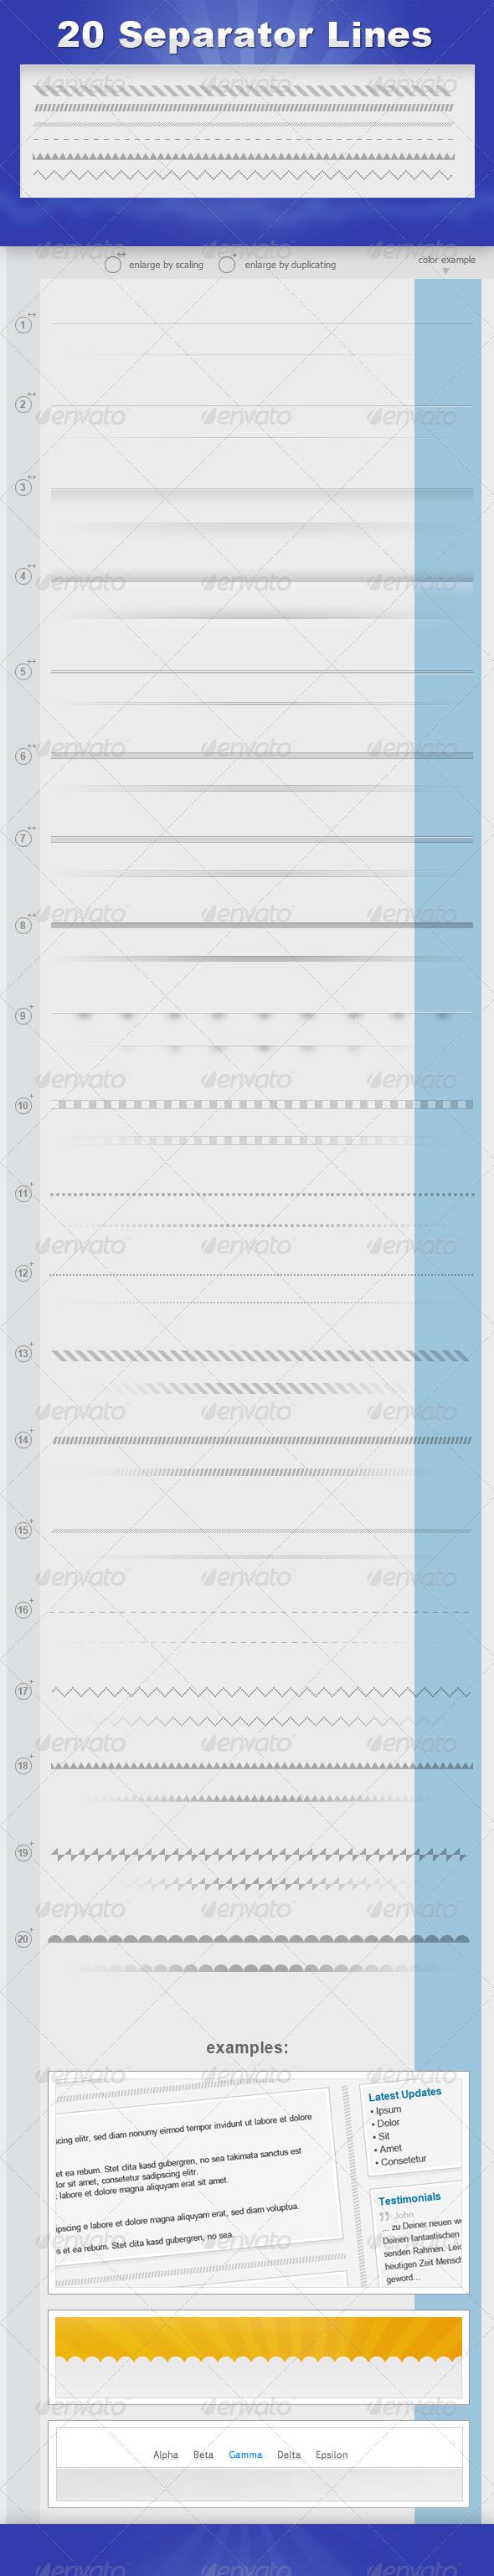 GraphicRiver 20 Separator Lines 1852785